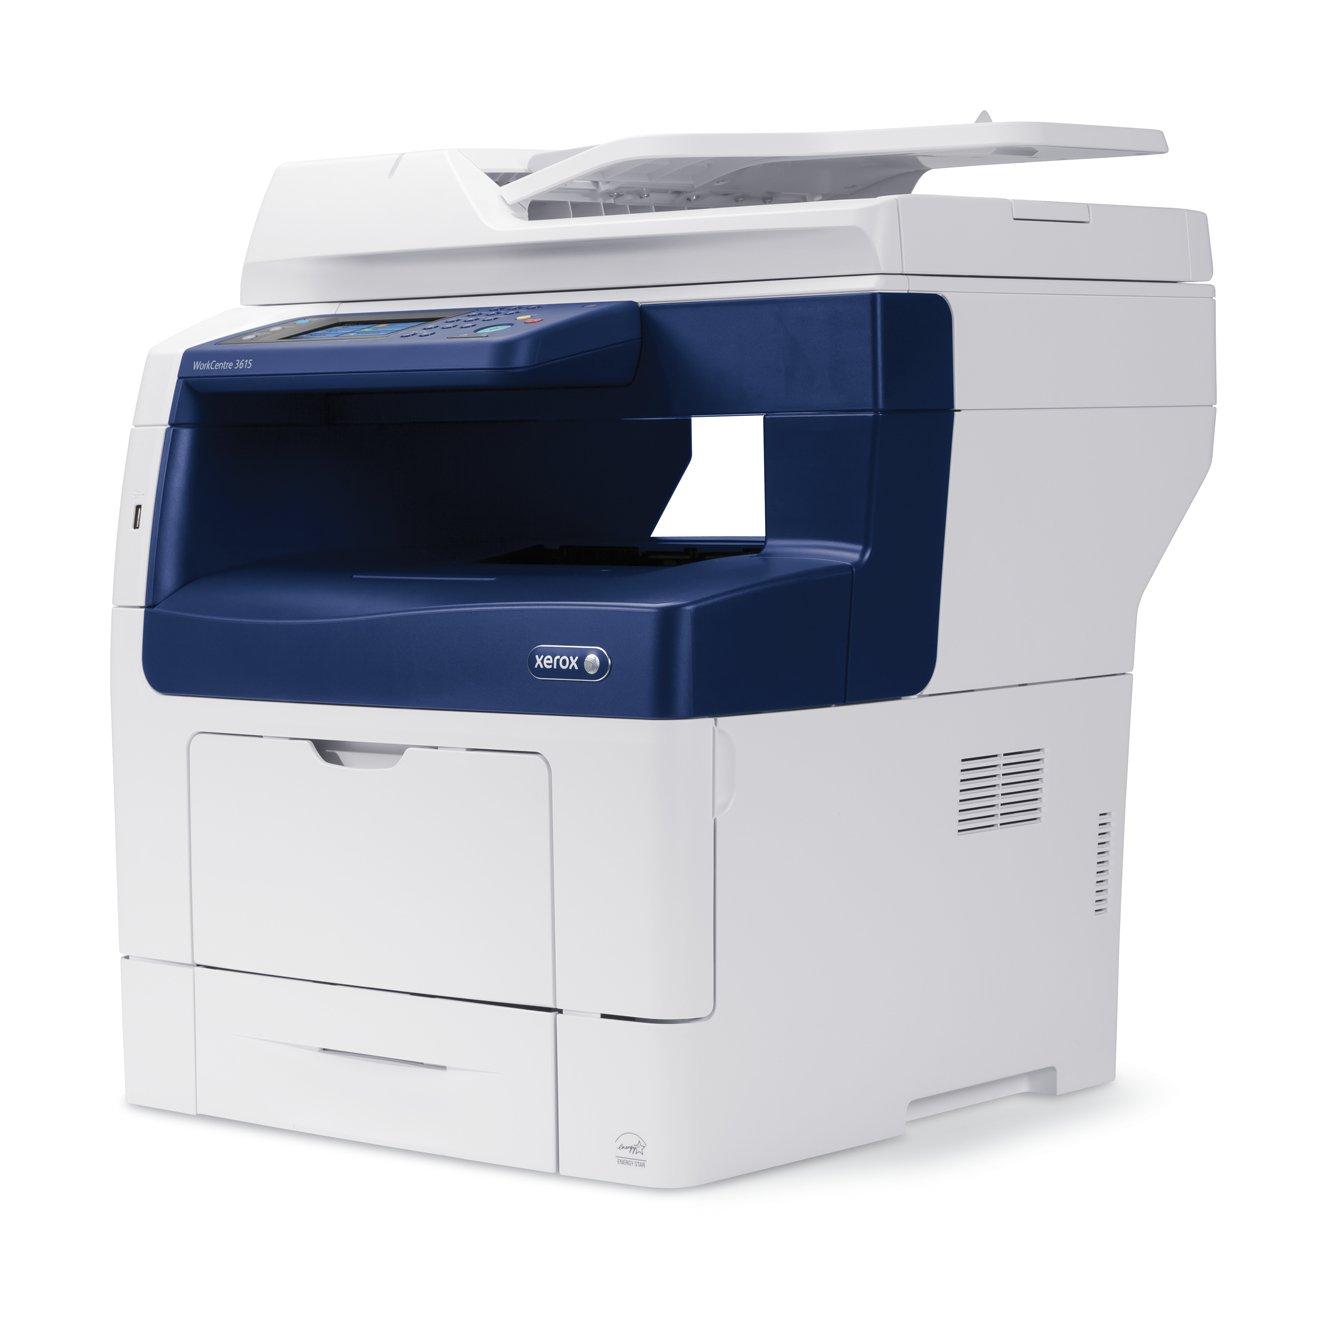 Xerox WorkCentre 3615/DN Monochrome Laser Multifunction Printer